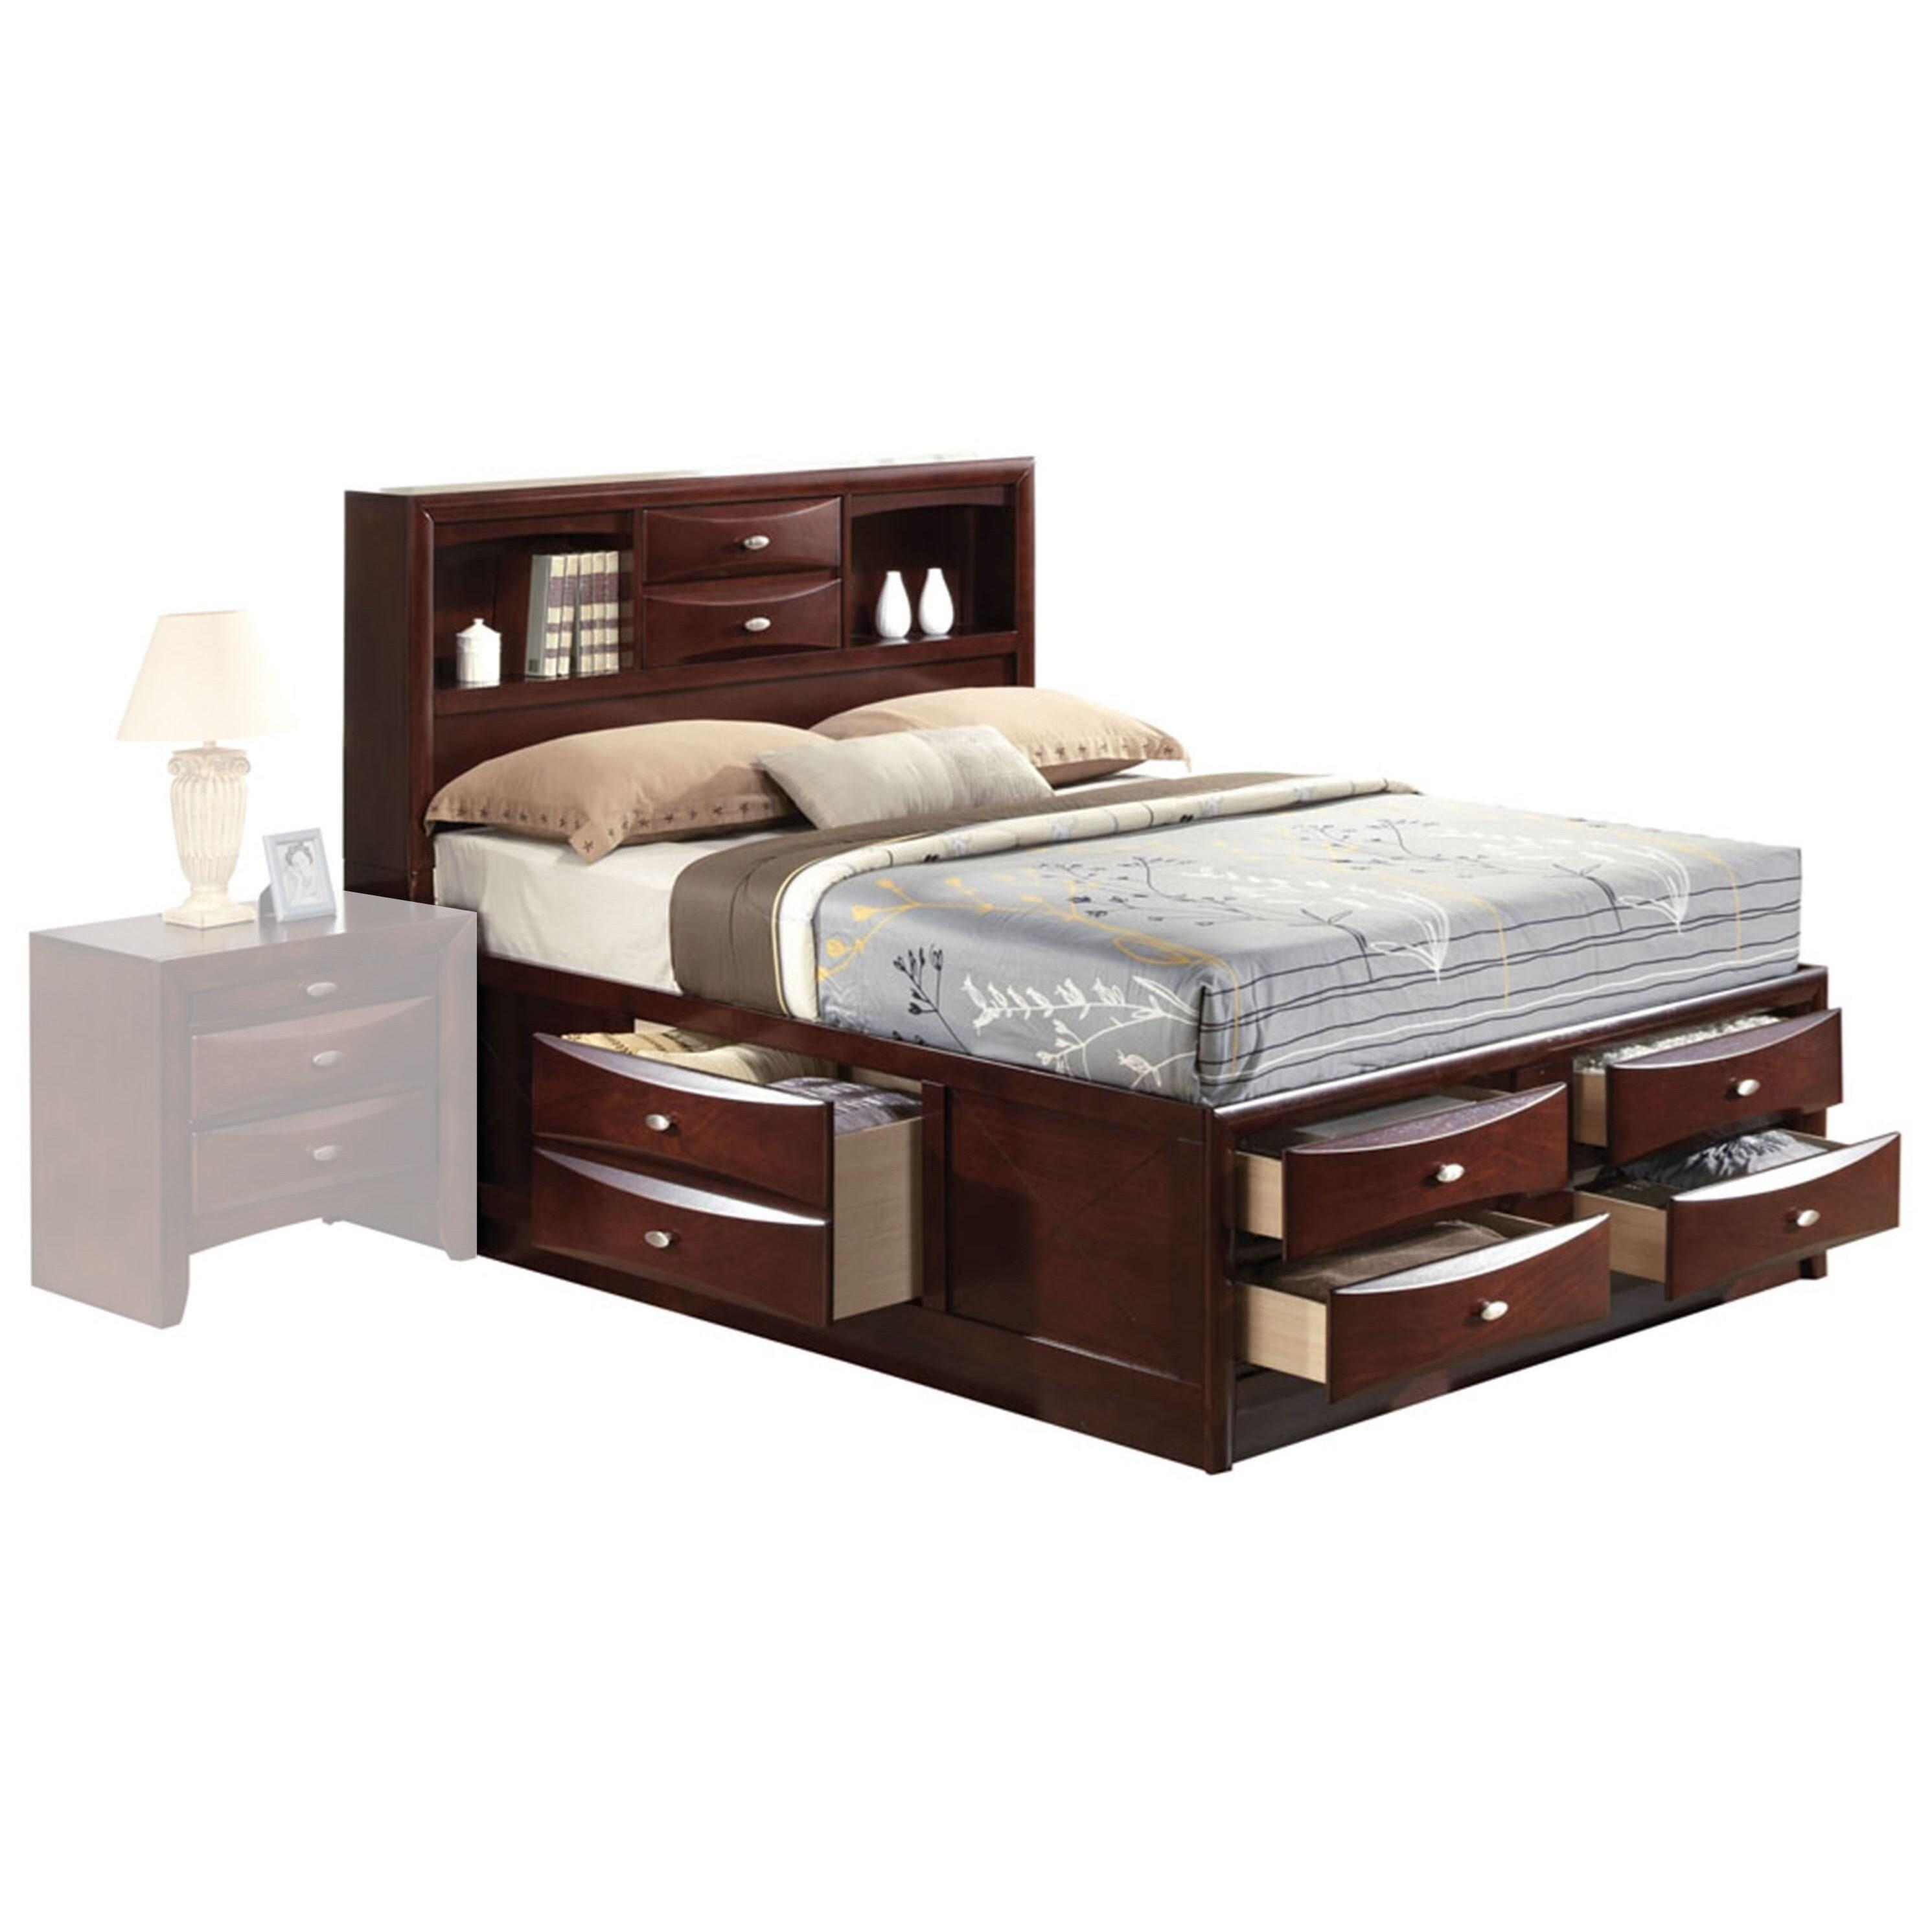 Ireland  Storage - Espresso Full Bed w/Storage by Acme Furniture at A1 Furniture & Mattress